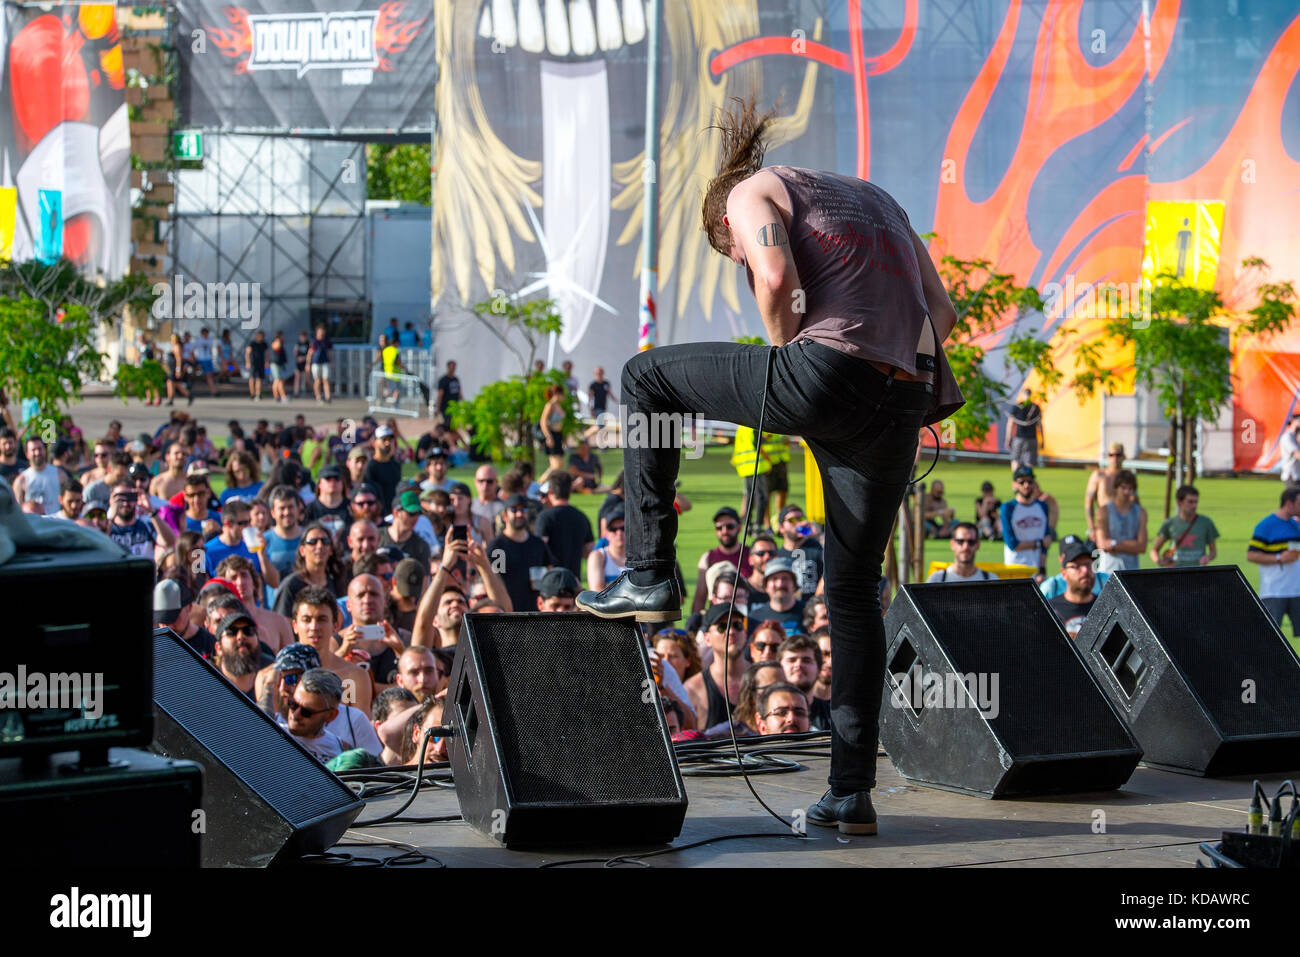 Madrid Jun 24 Deafheaven Metal Music Band Perform In Concert At